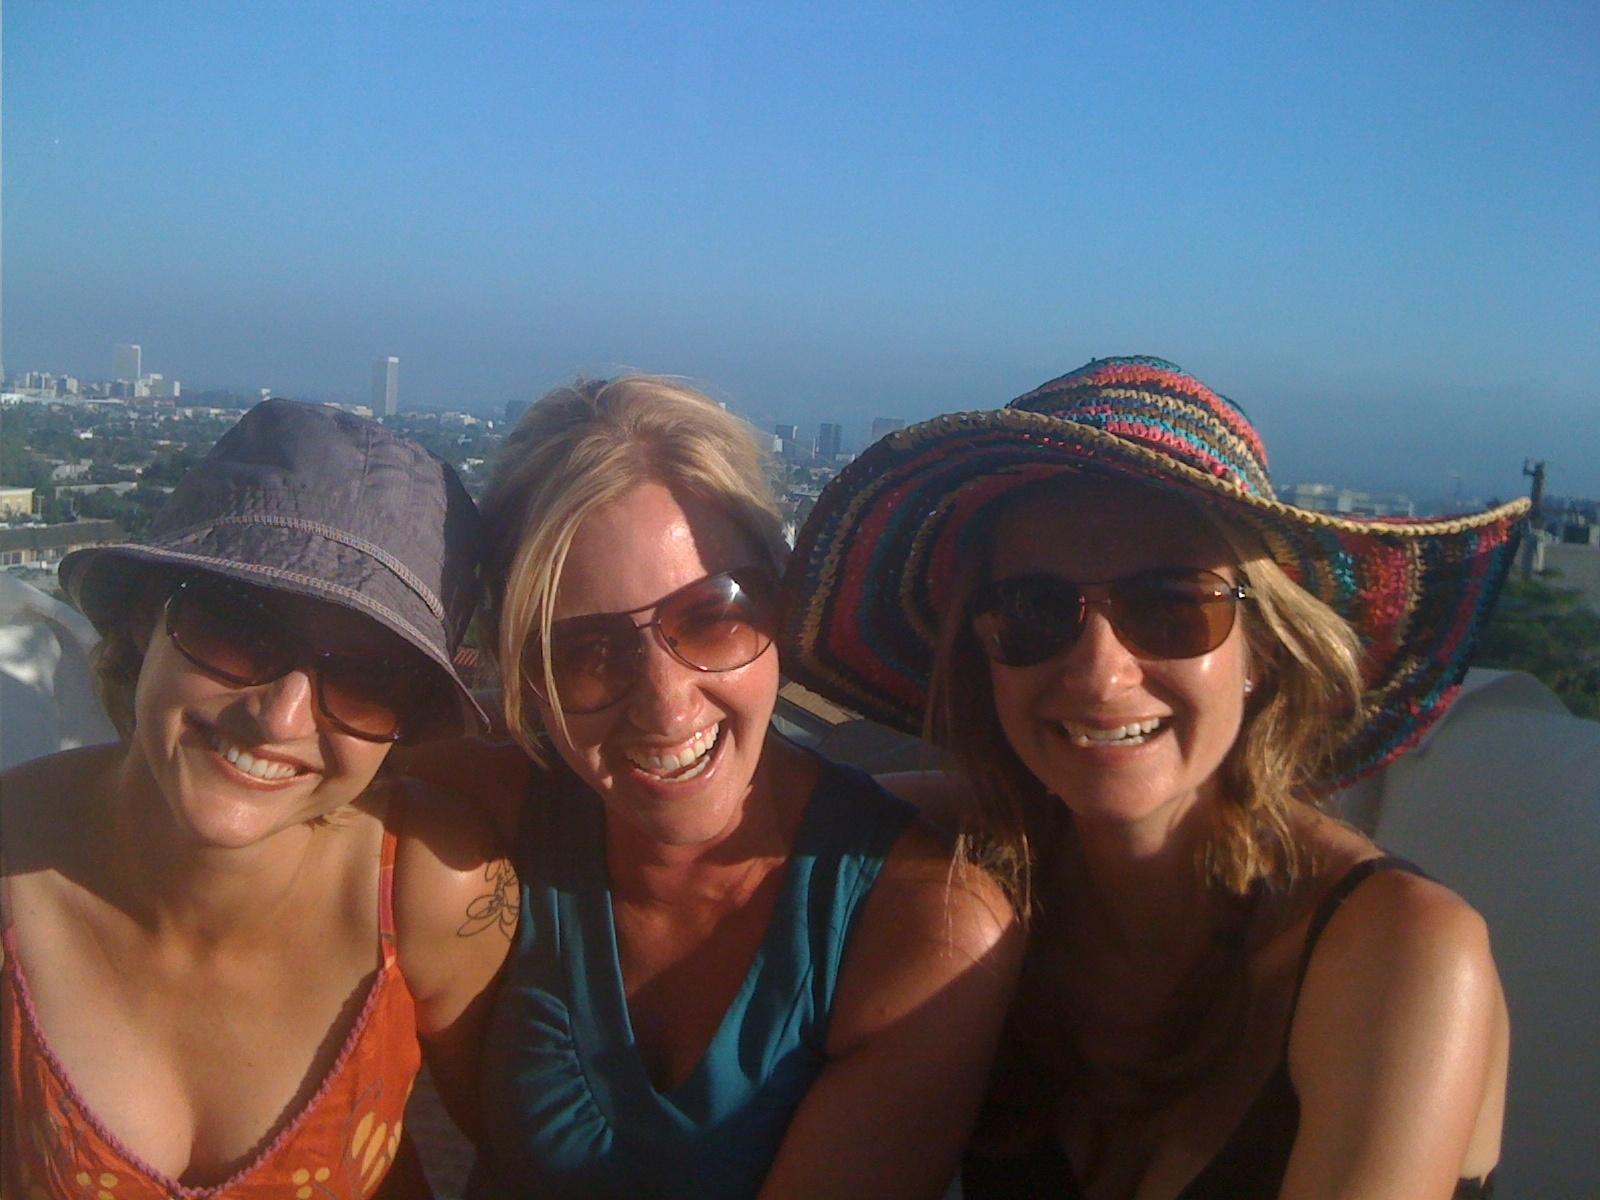 OC Register: Female friendships have a big impact